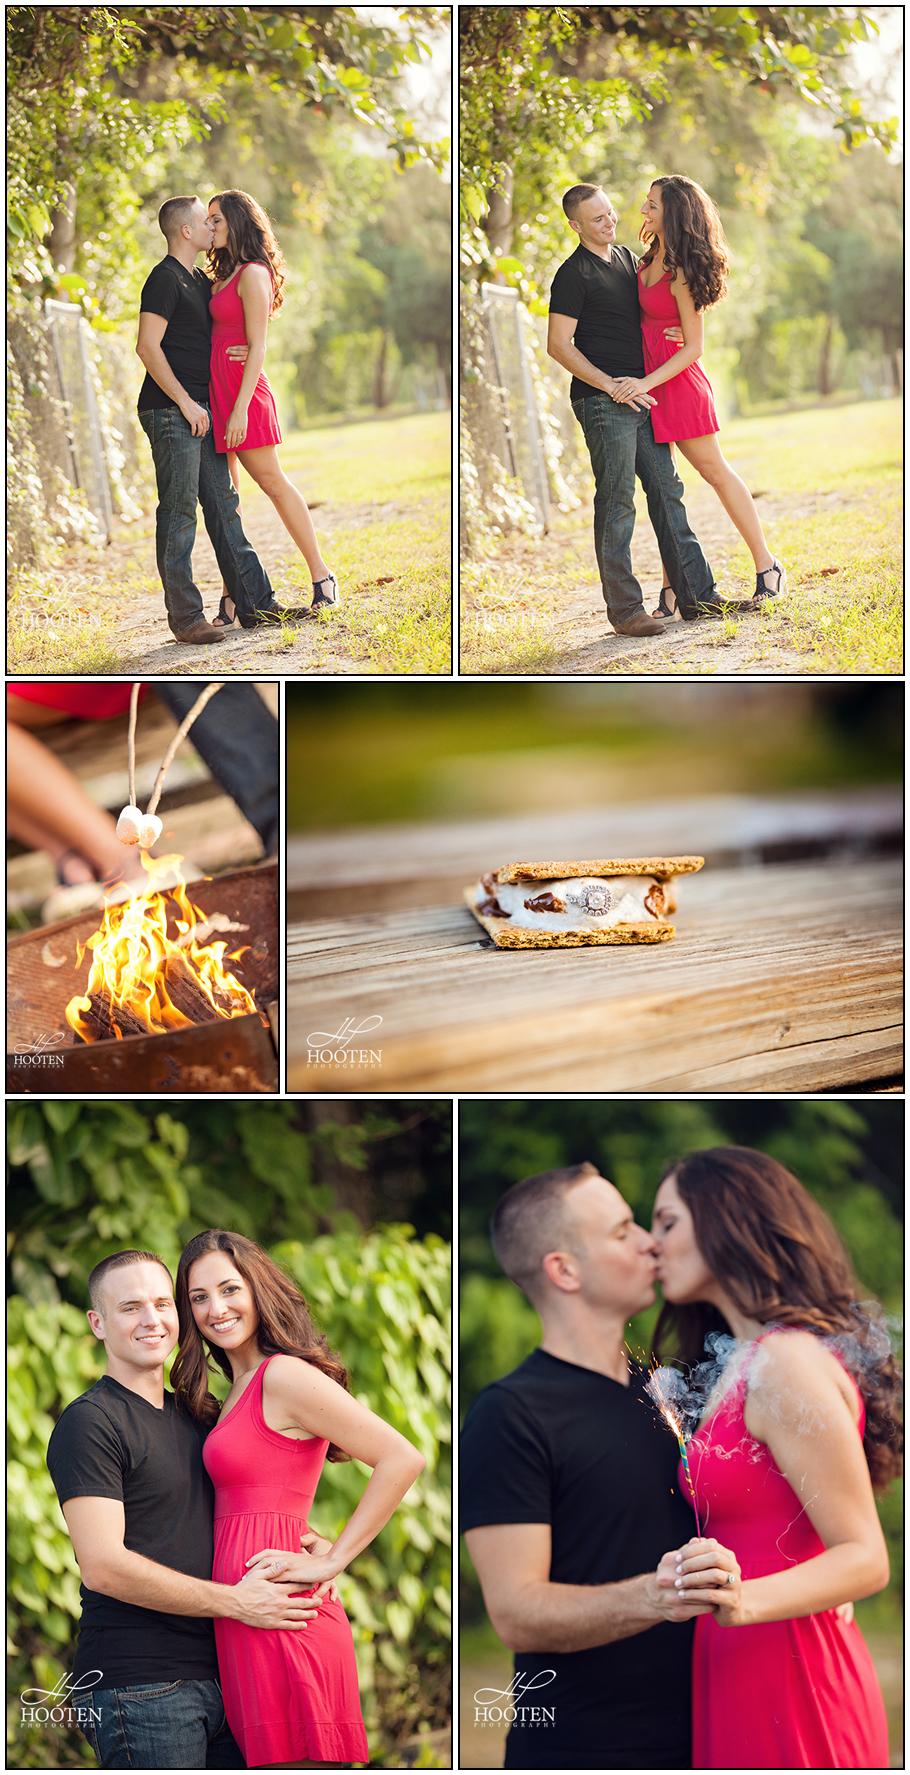 Miami-Engagement-Photography-Davie-Ranch-Camping-Kristen-William-Photo.jpg